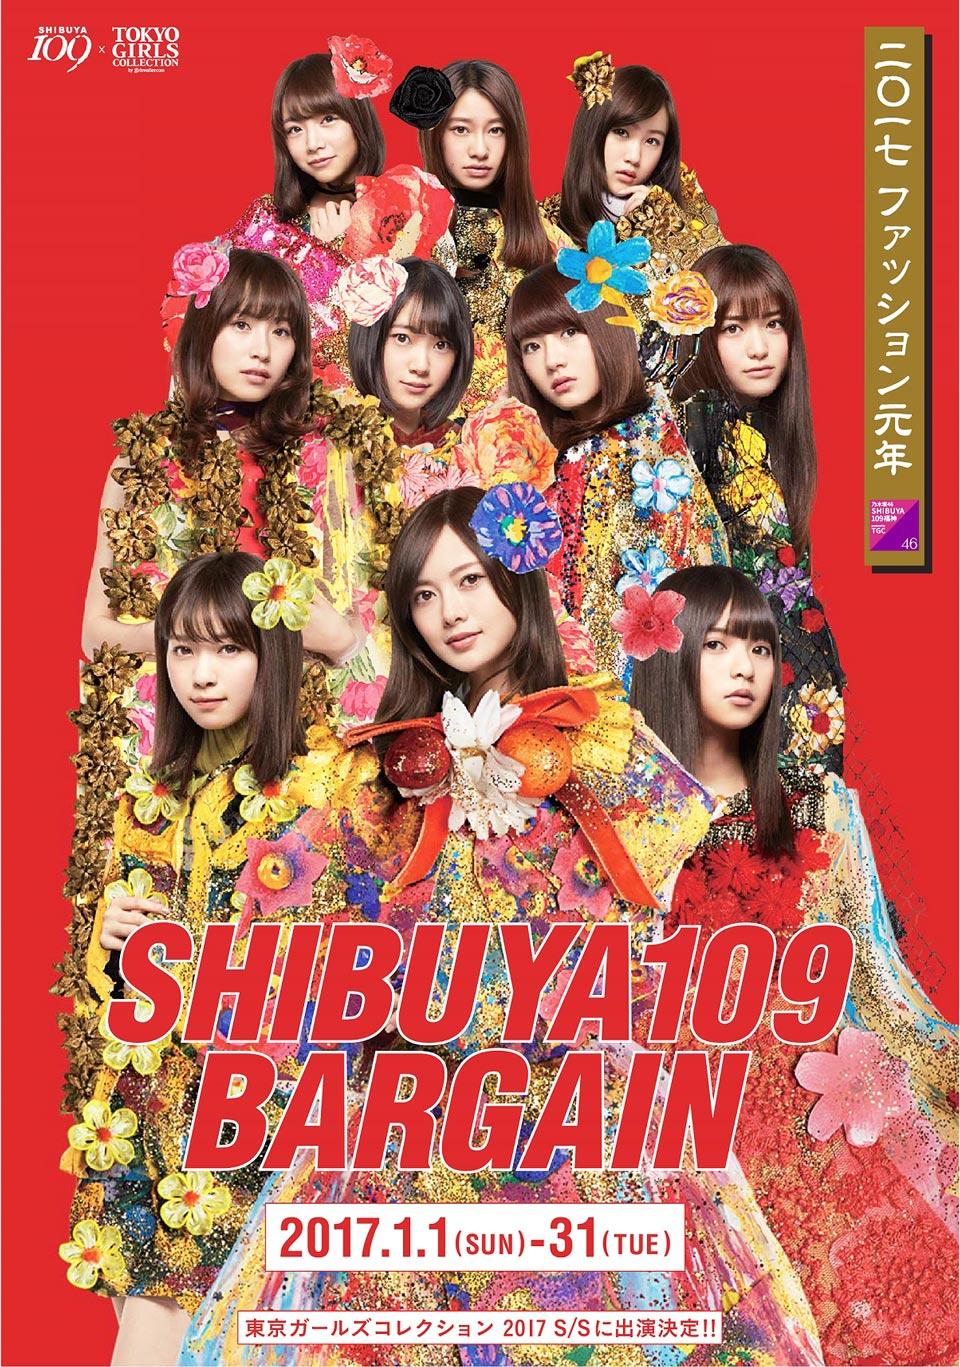 乃木坂46 SHIBUYA109福神 produced by TGC